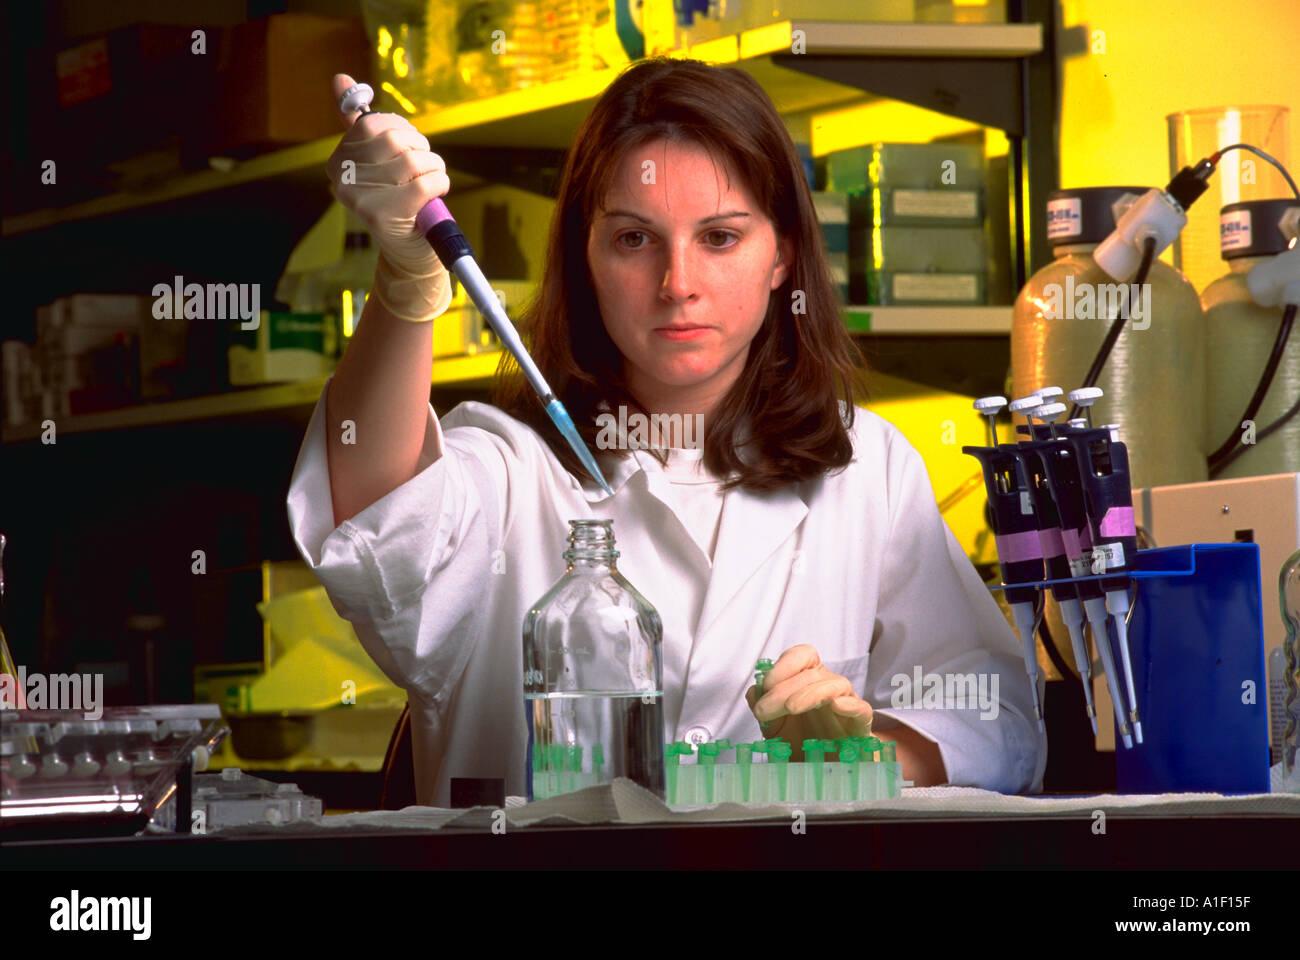 Biotechnology Jobs Stock Photos & Biotechnology Jobs Stock